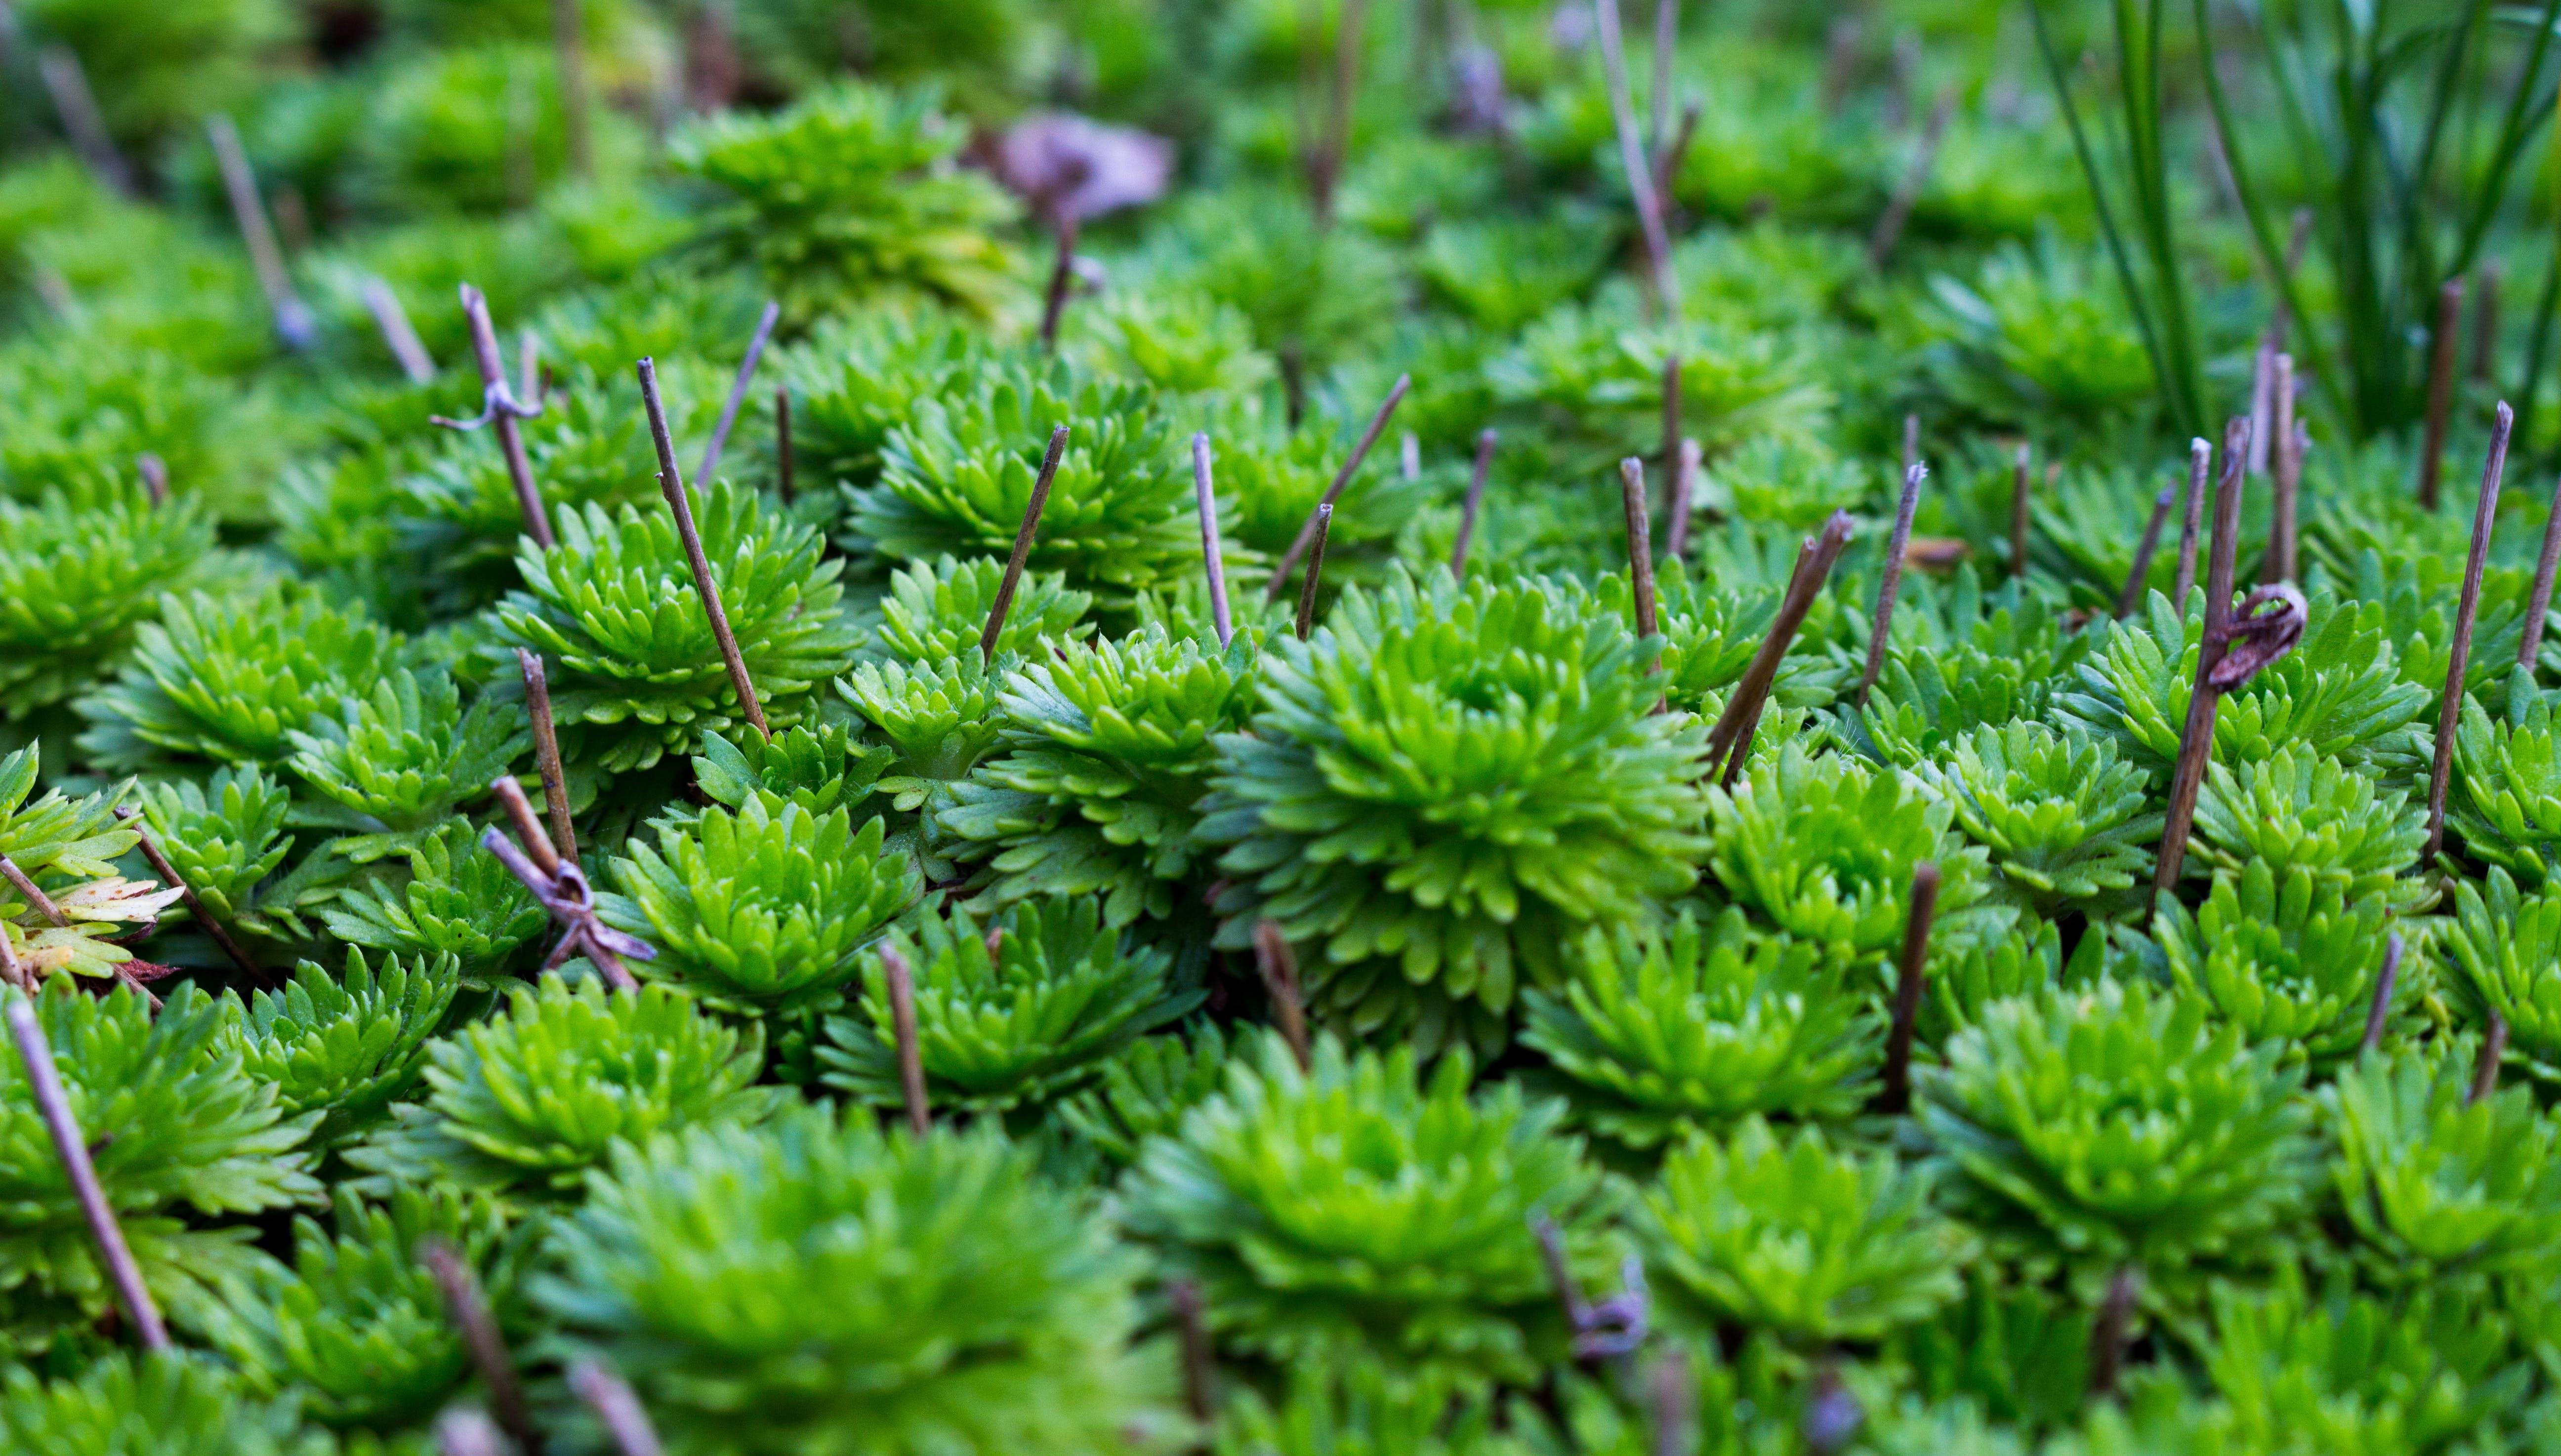 botanical, close-up, environment